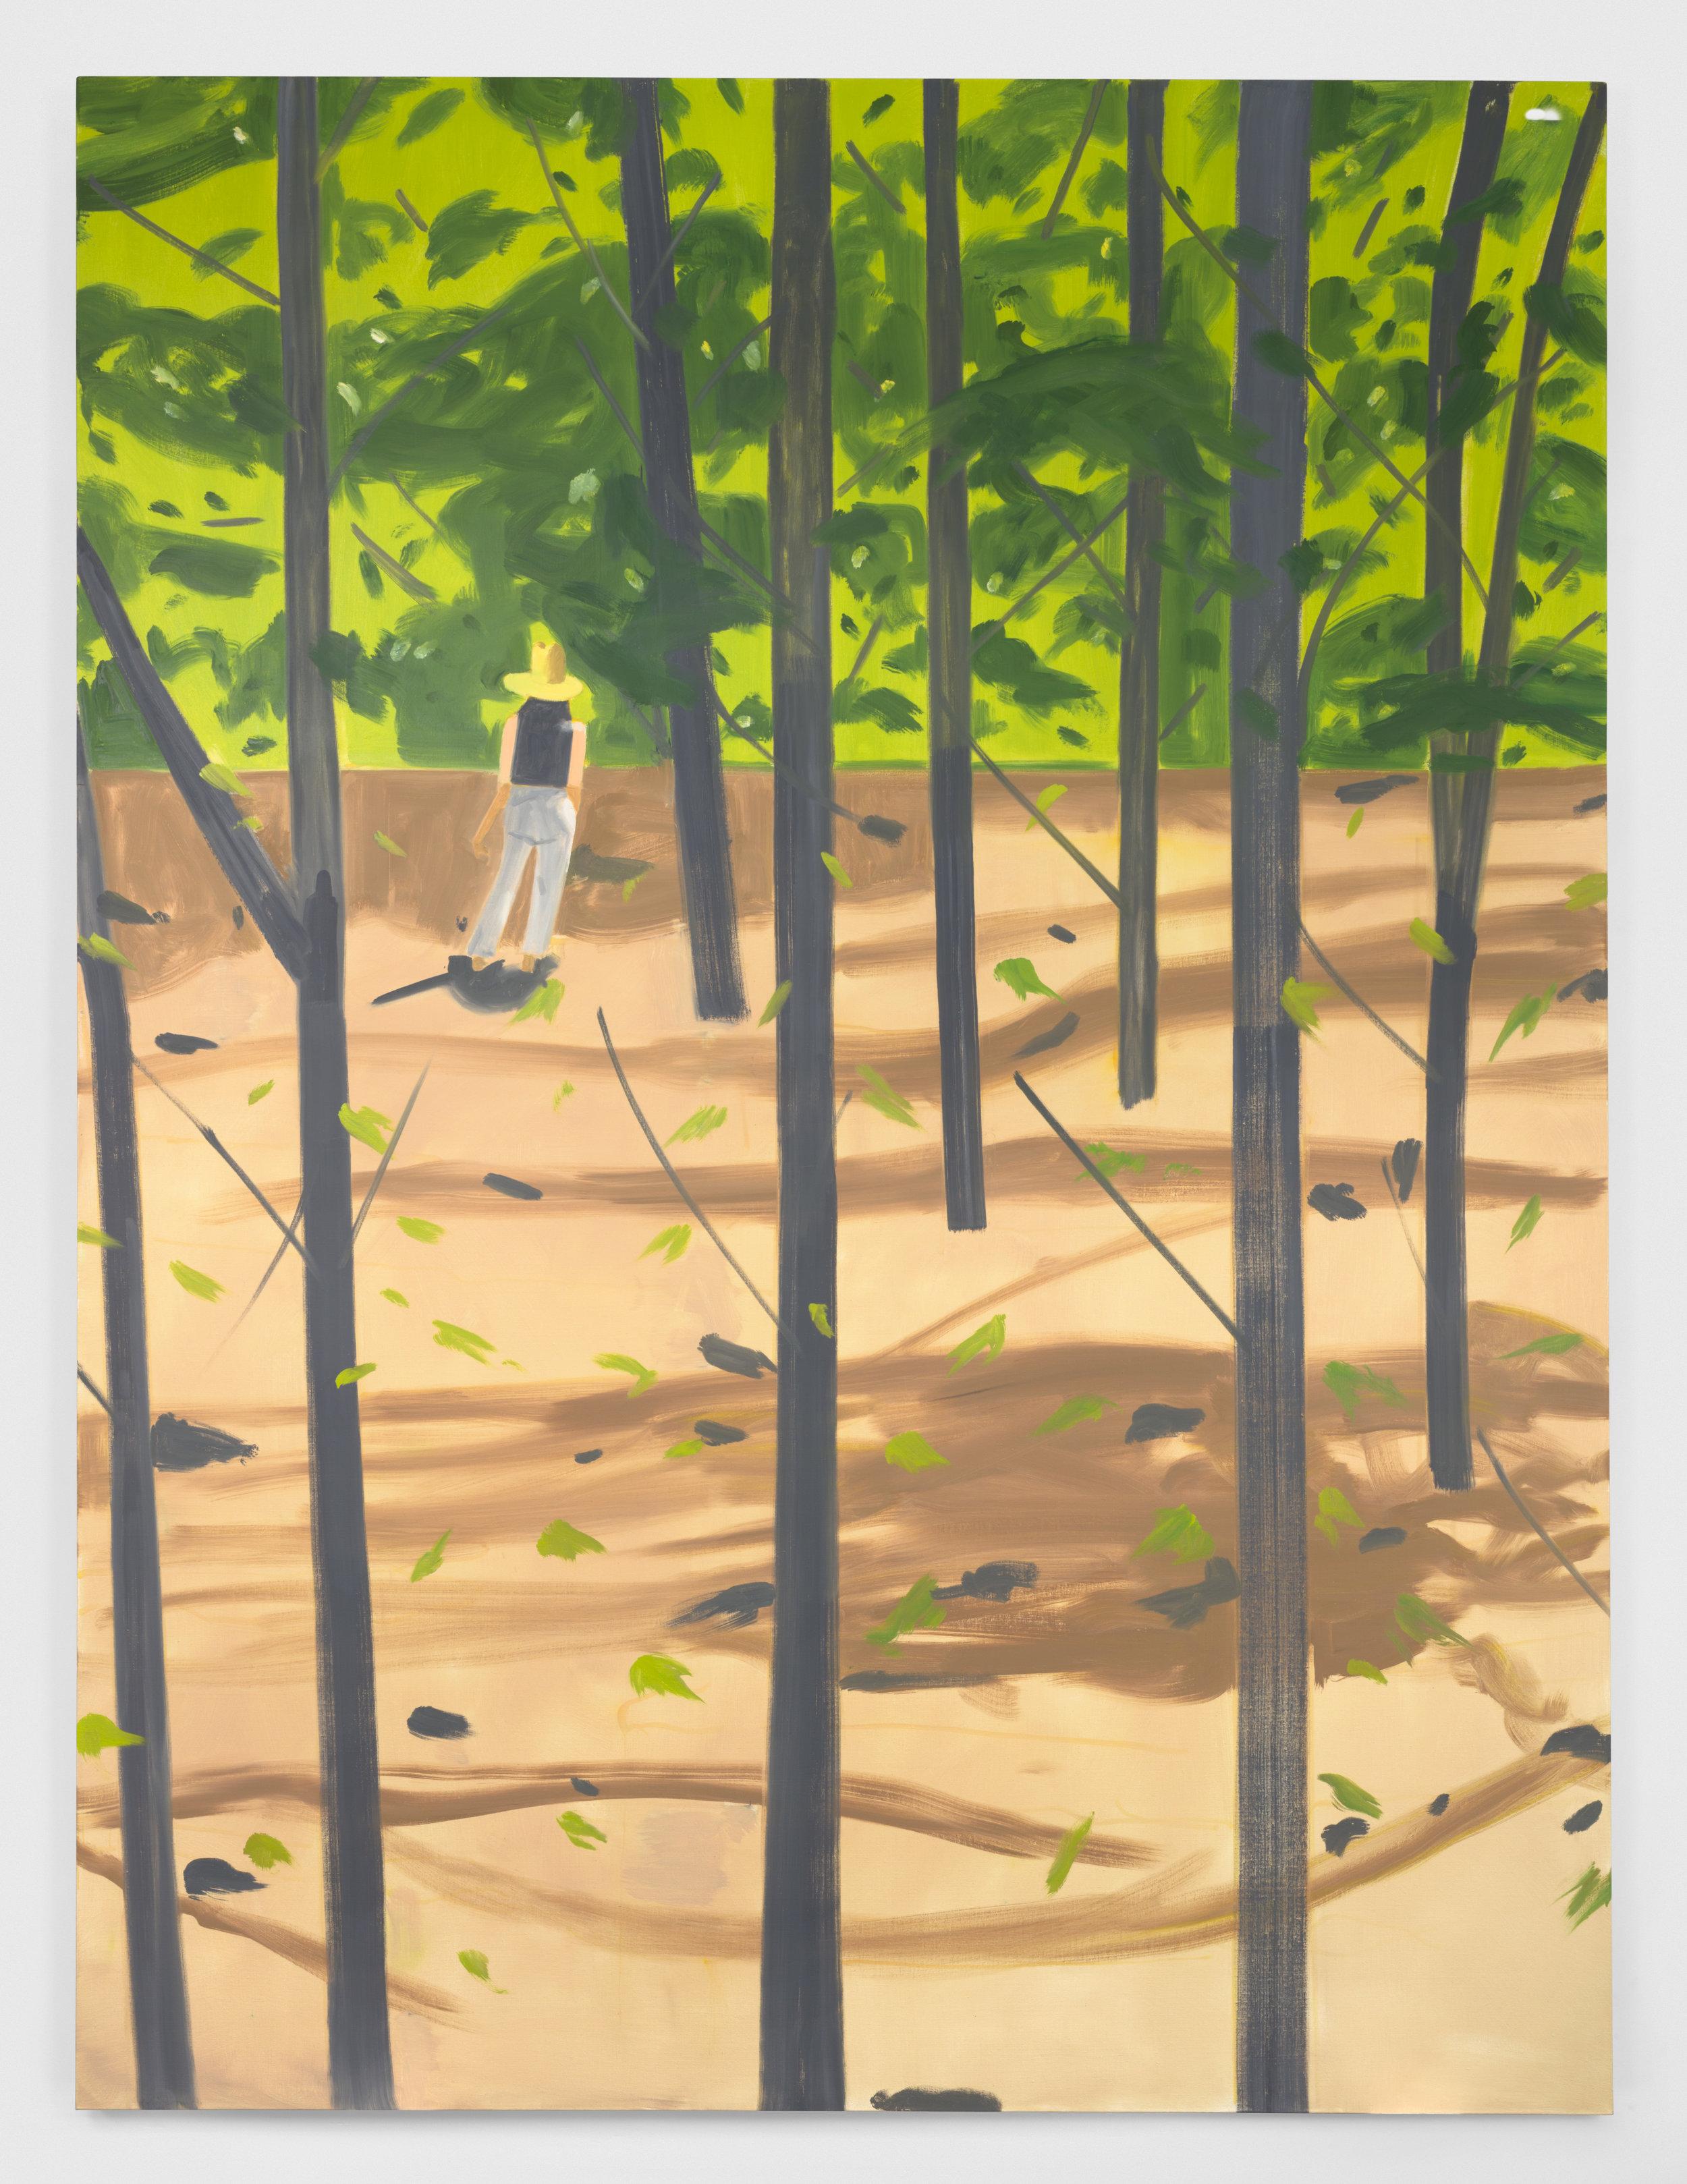 Alex Katz  Figure in the Woods   , 2016  Oil on canvas 365.8 x 264.2 cm © Alex Katz / Adagp, Paris, 2019 Picture: Courtesy Gavin Brown Enterprise New York